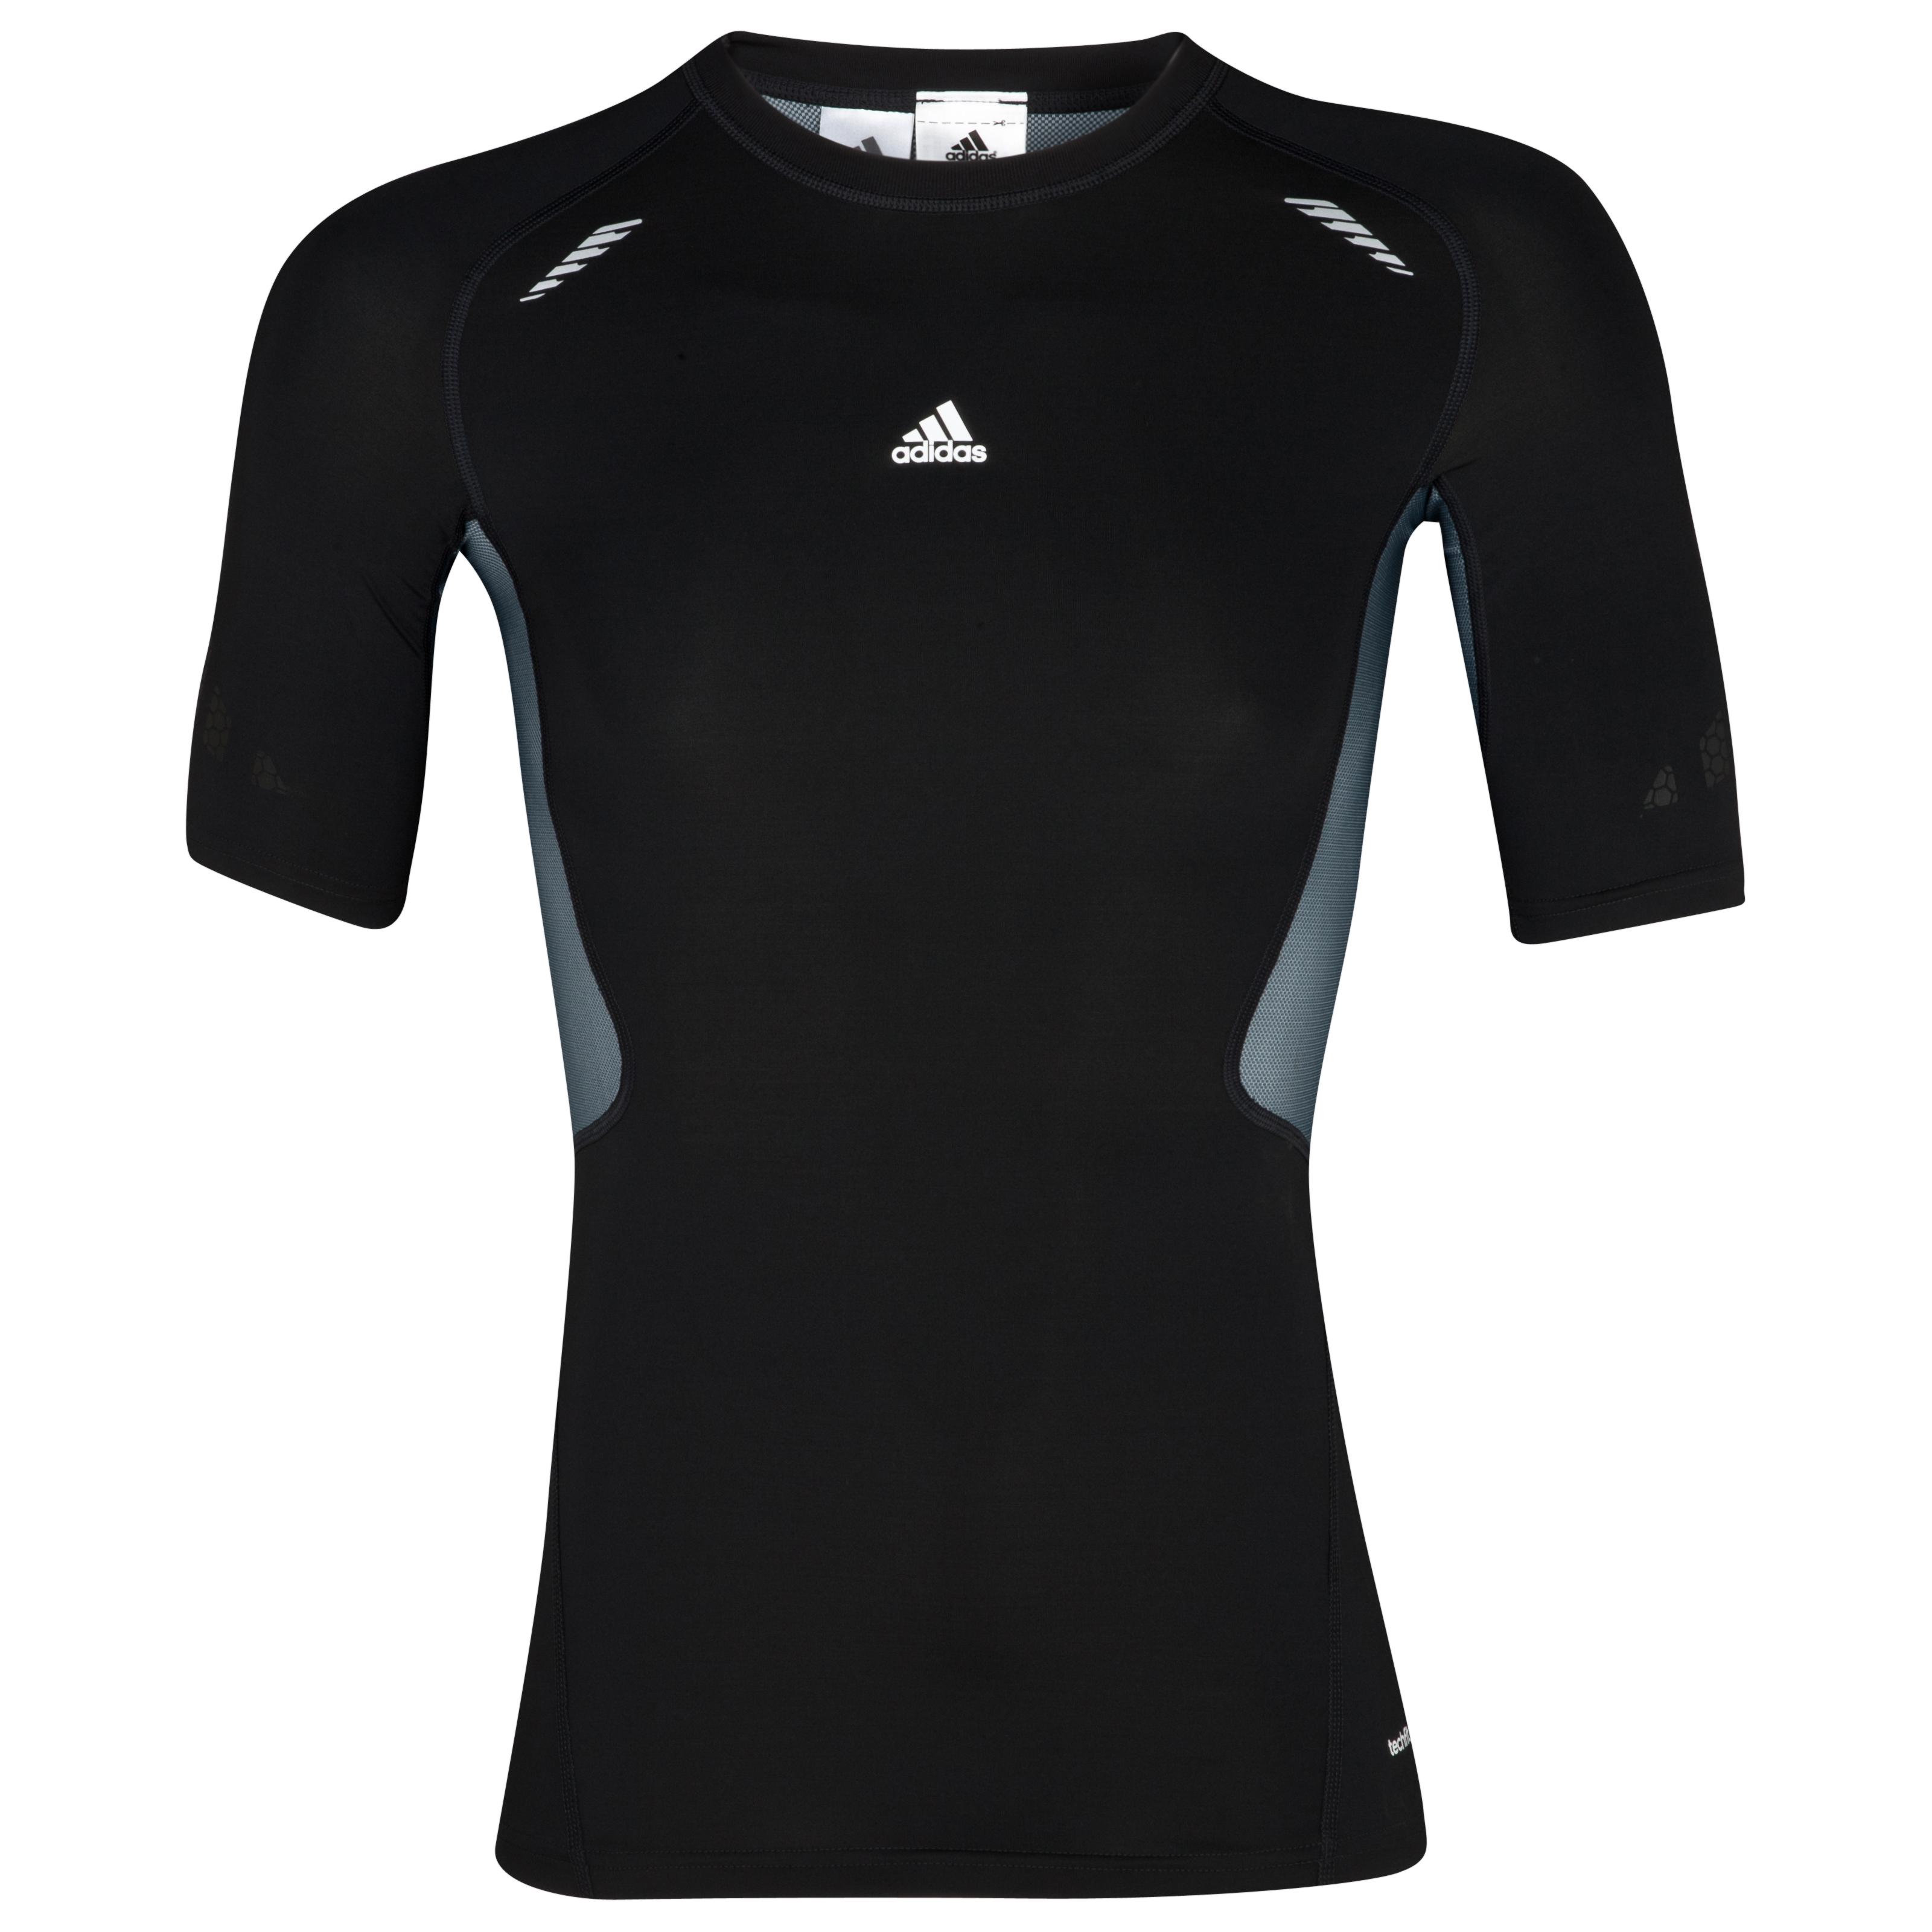 Adidas TechFit Preperation Top - Short Sleeve - Black